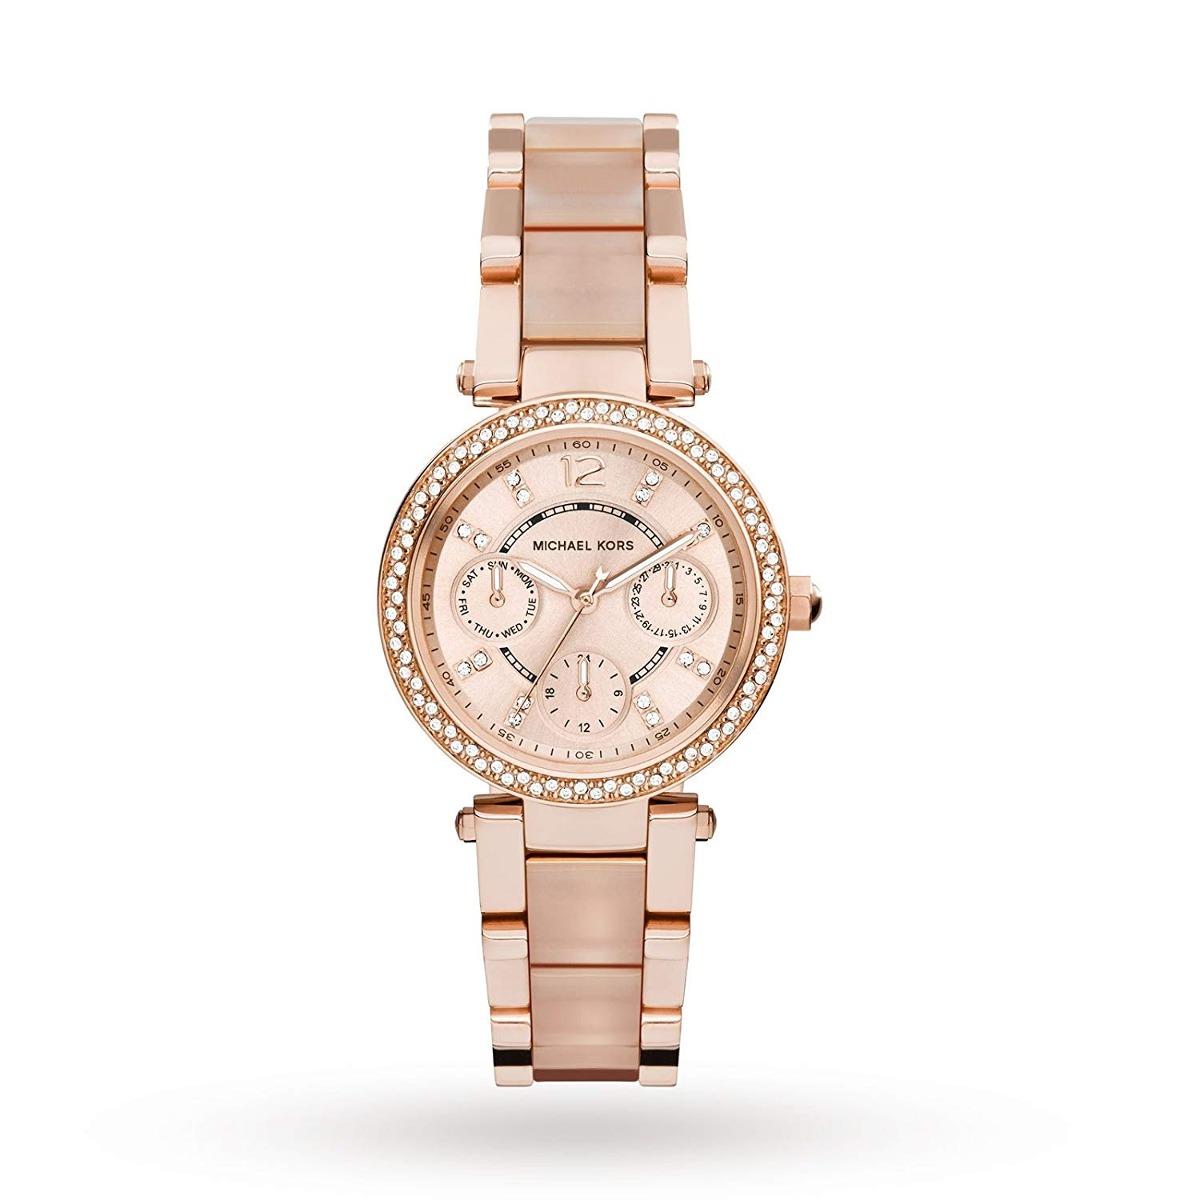 92fa94eab57d reloj para mujer michael kors color oro rosa sport parker. Cargando zoom.